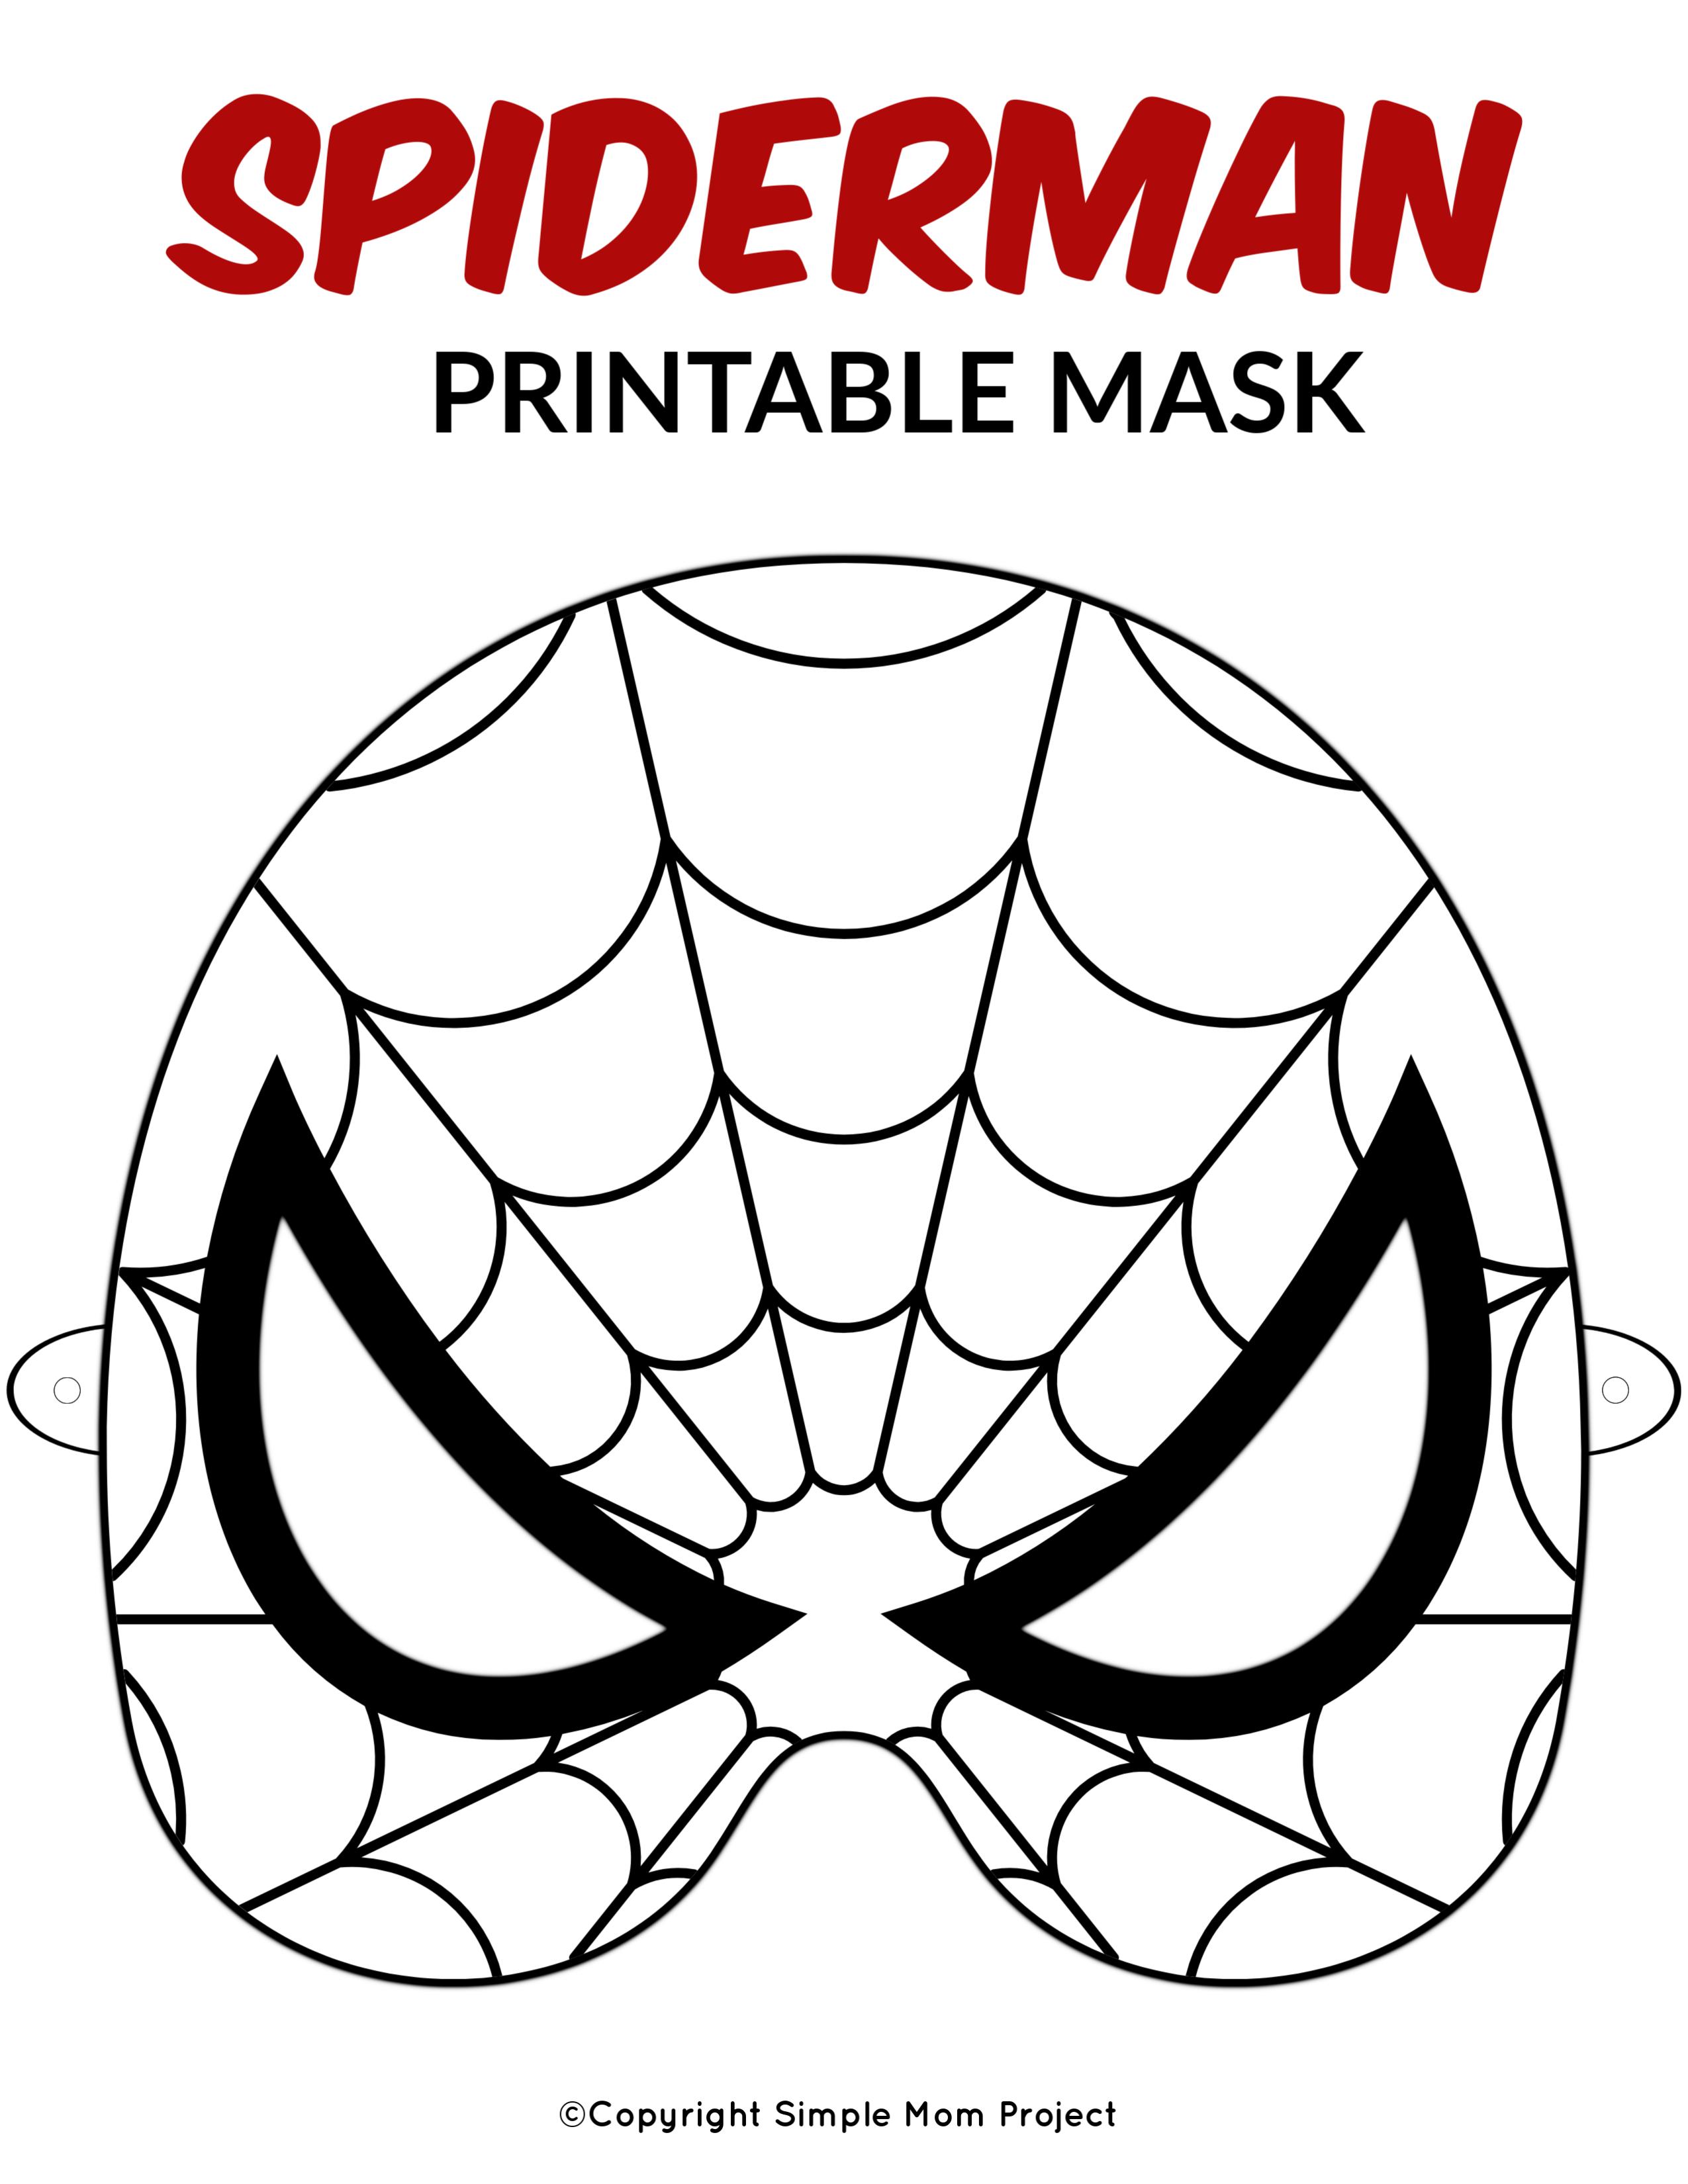 Free Printable Superhero Face Masks For Kids - Simple Mom Project - Free Printable Masks